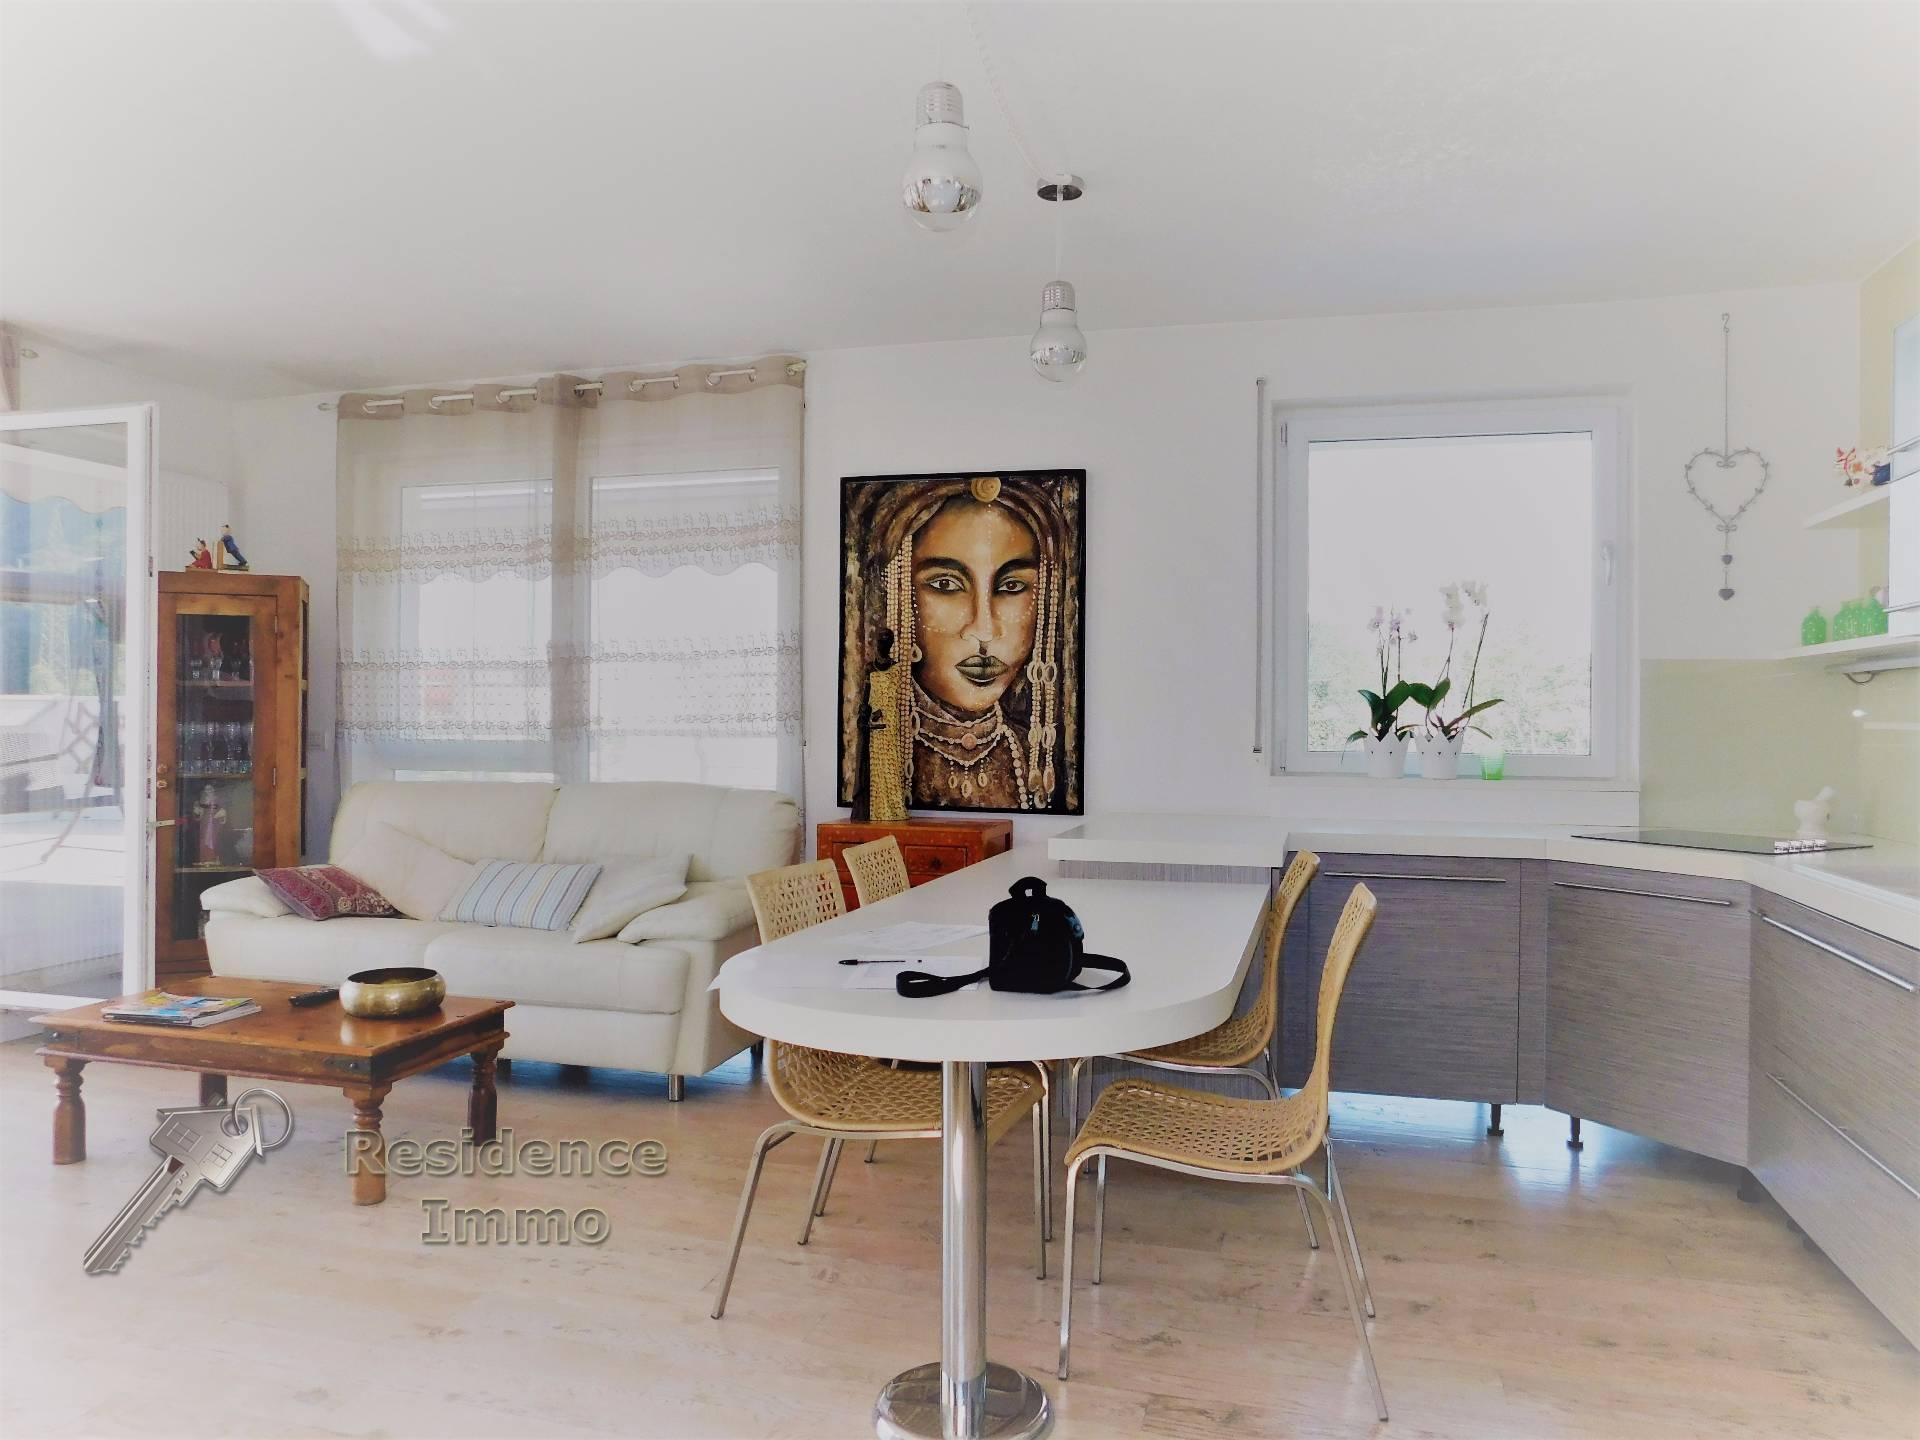 wohnung attika kaufen in bolzano bozen kodex 2074. Black Bedroom Furniture Sets. Home Design Ideas